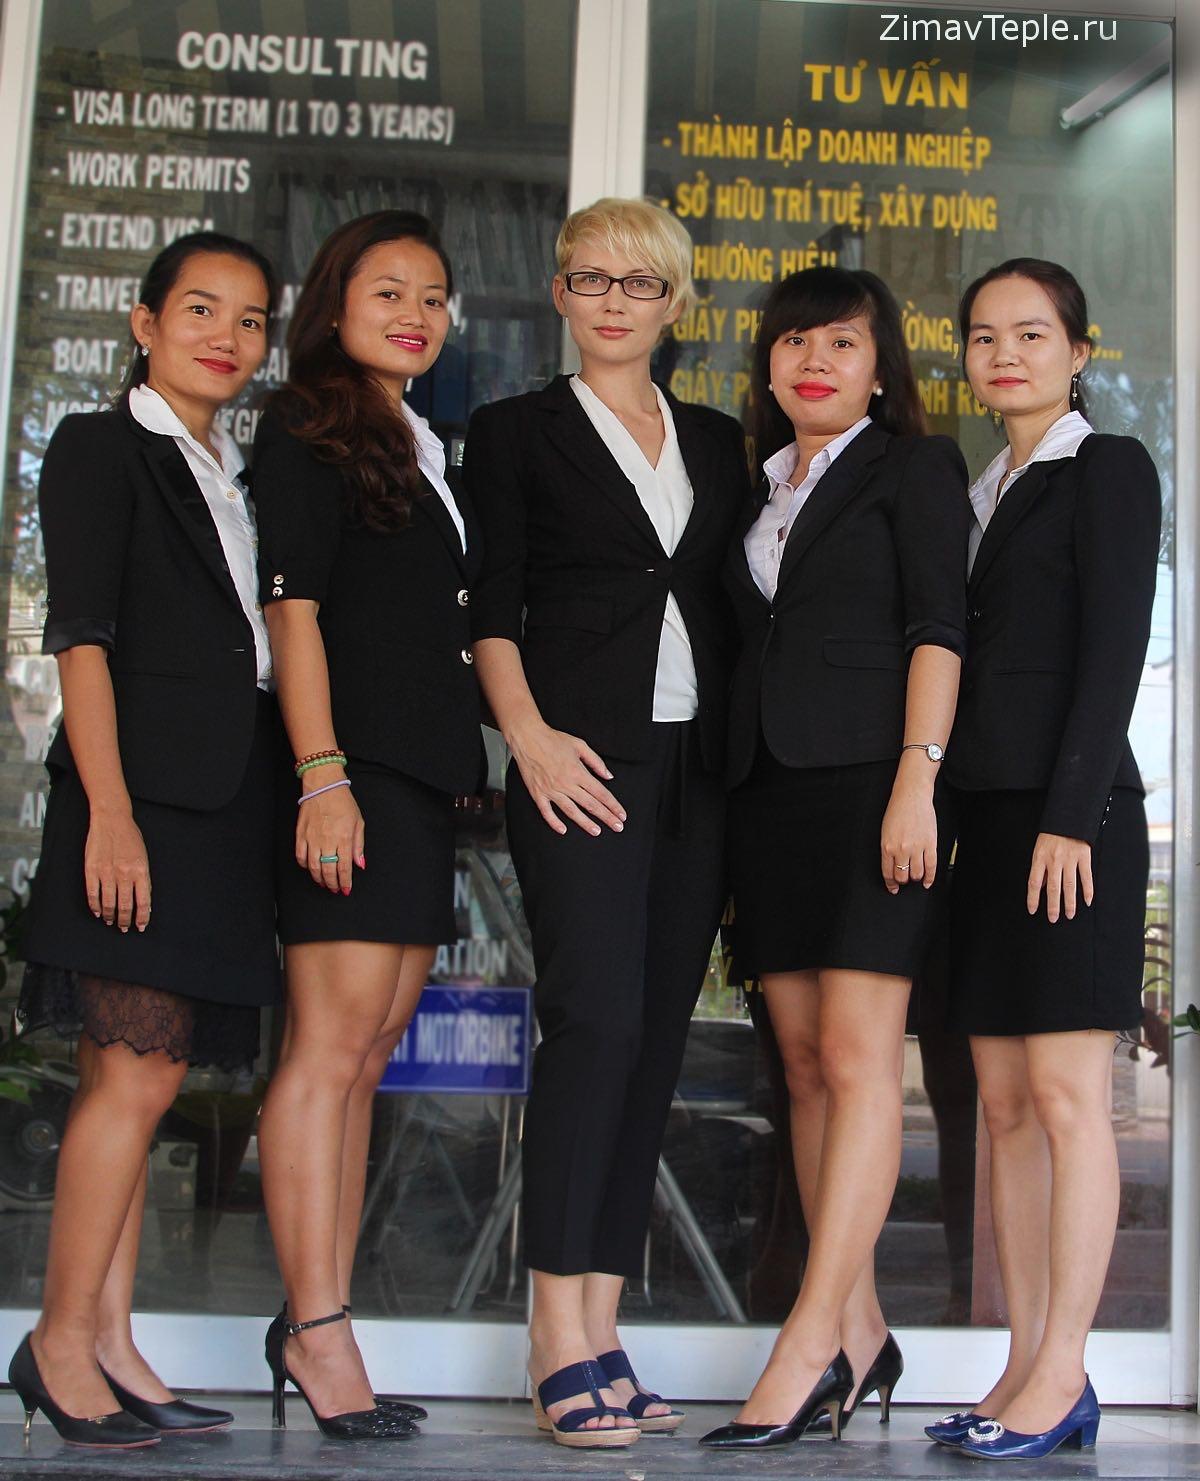 Сотрудники компании Зима в Тепле Нячанг